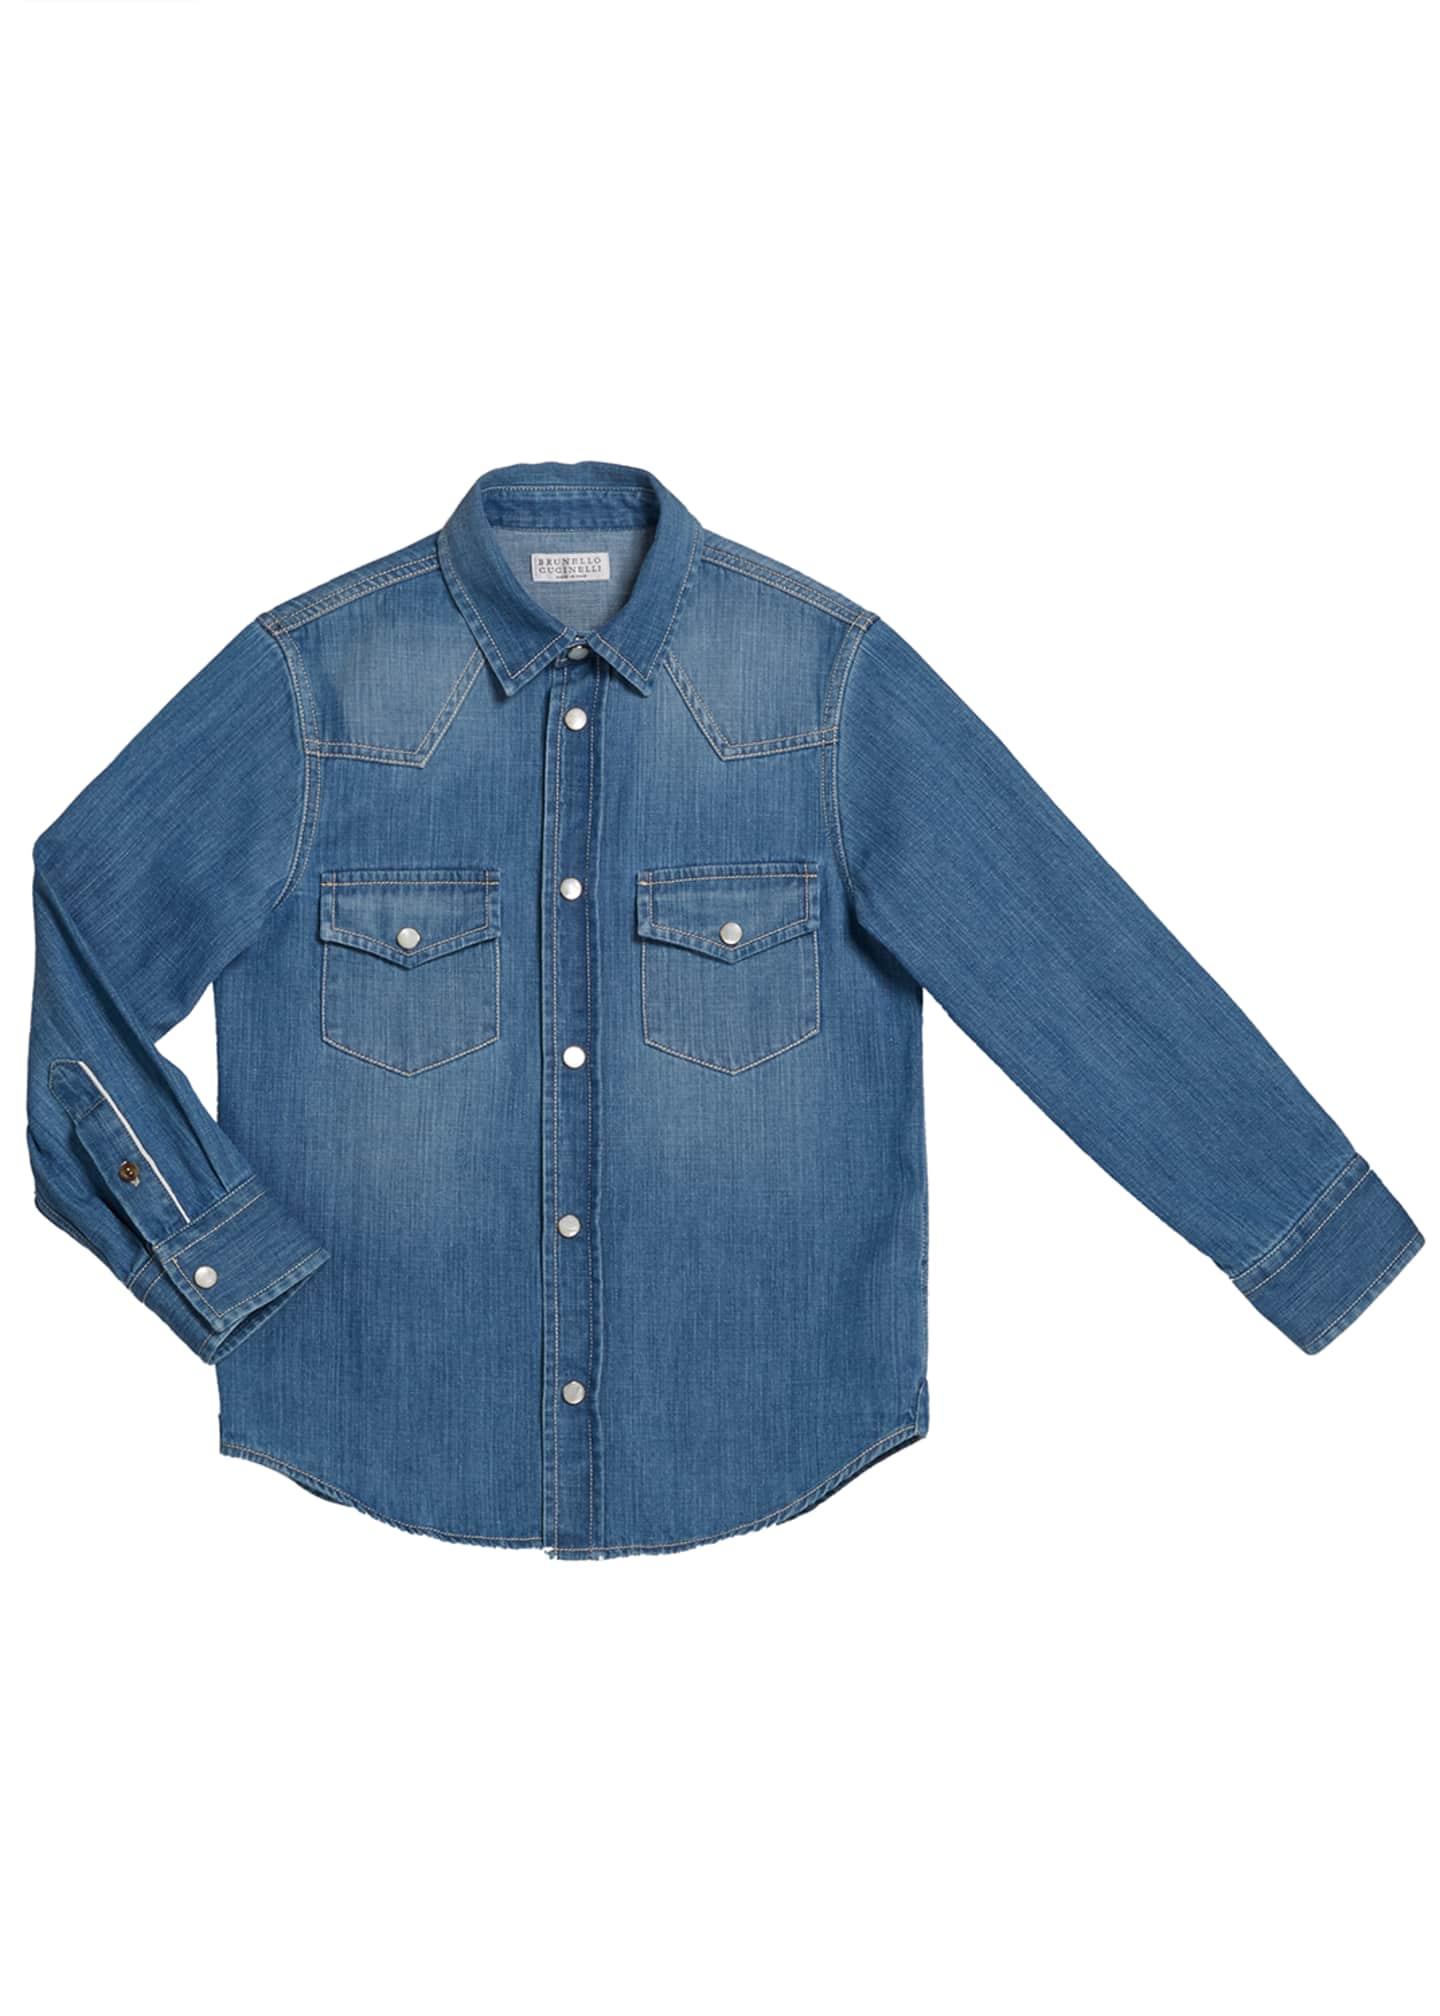 Brunello Cucinelli Boy's Long-Sleeve Button-Down Denim Shirt,